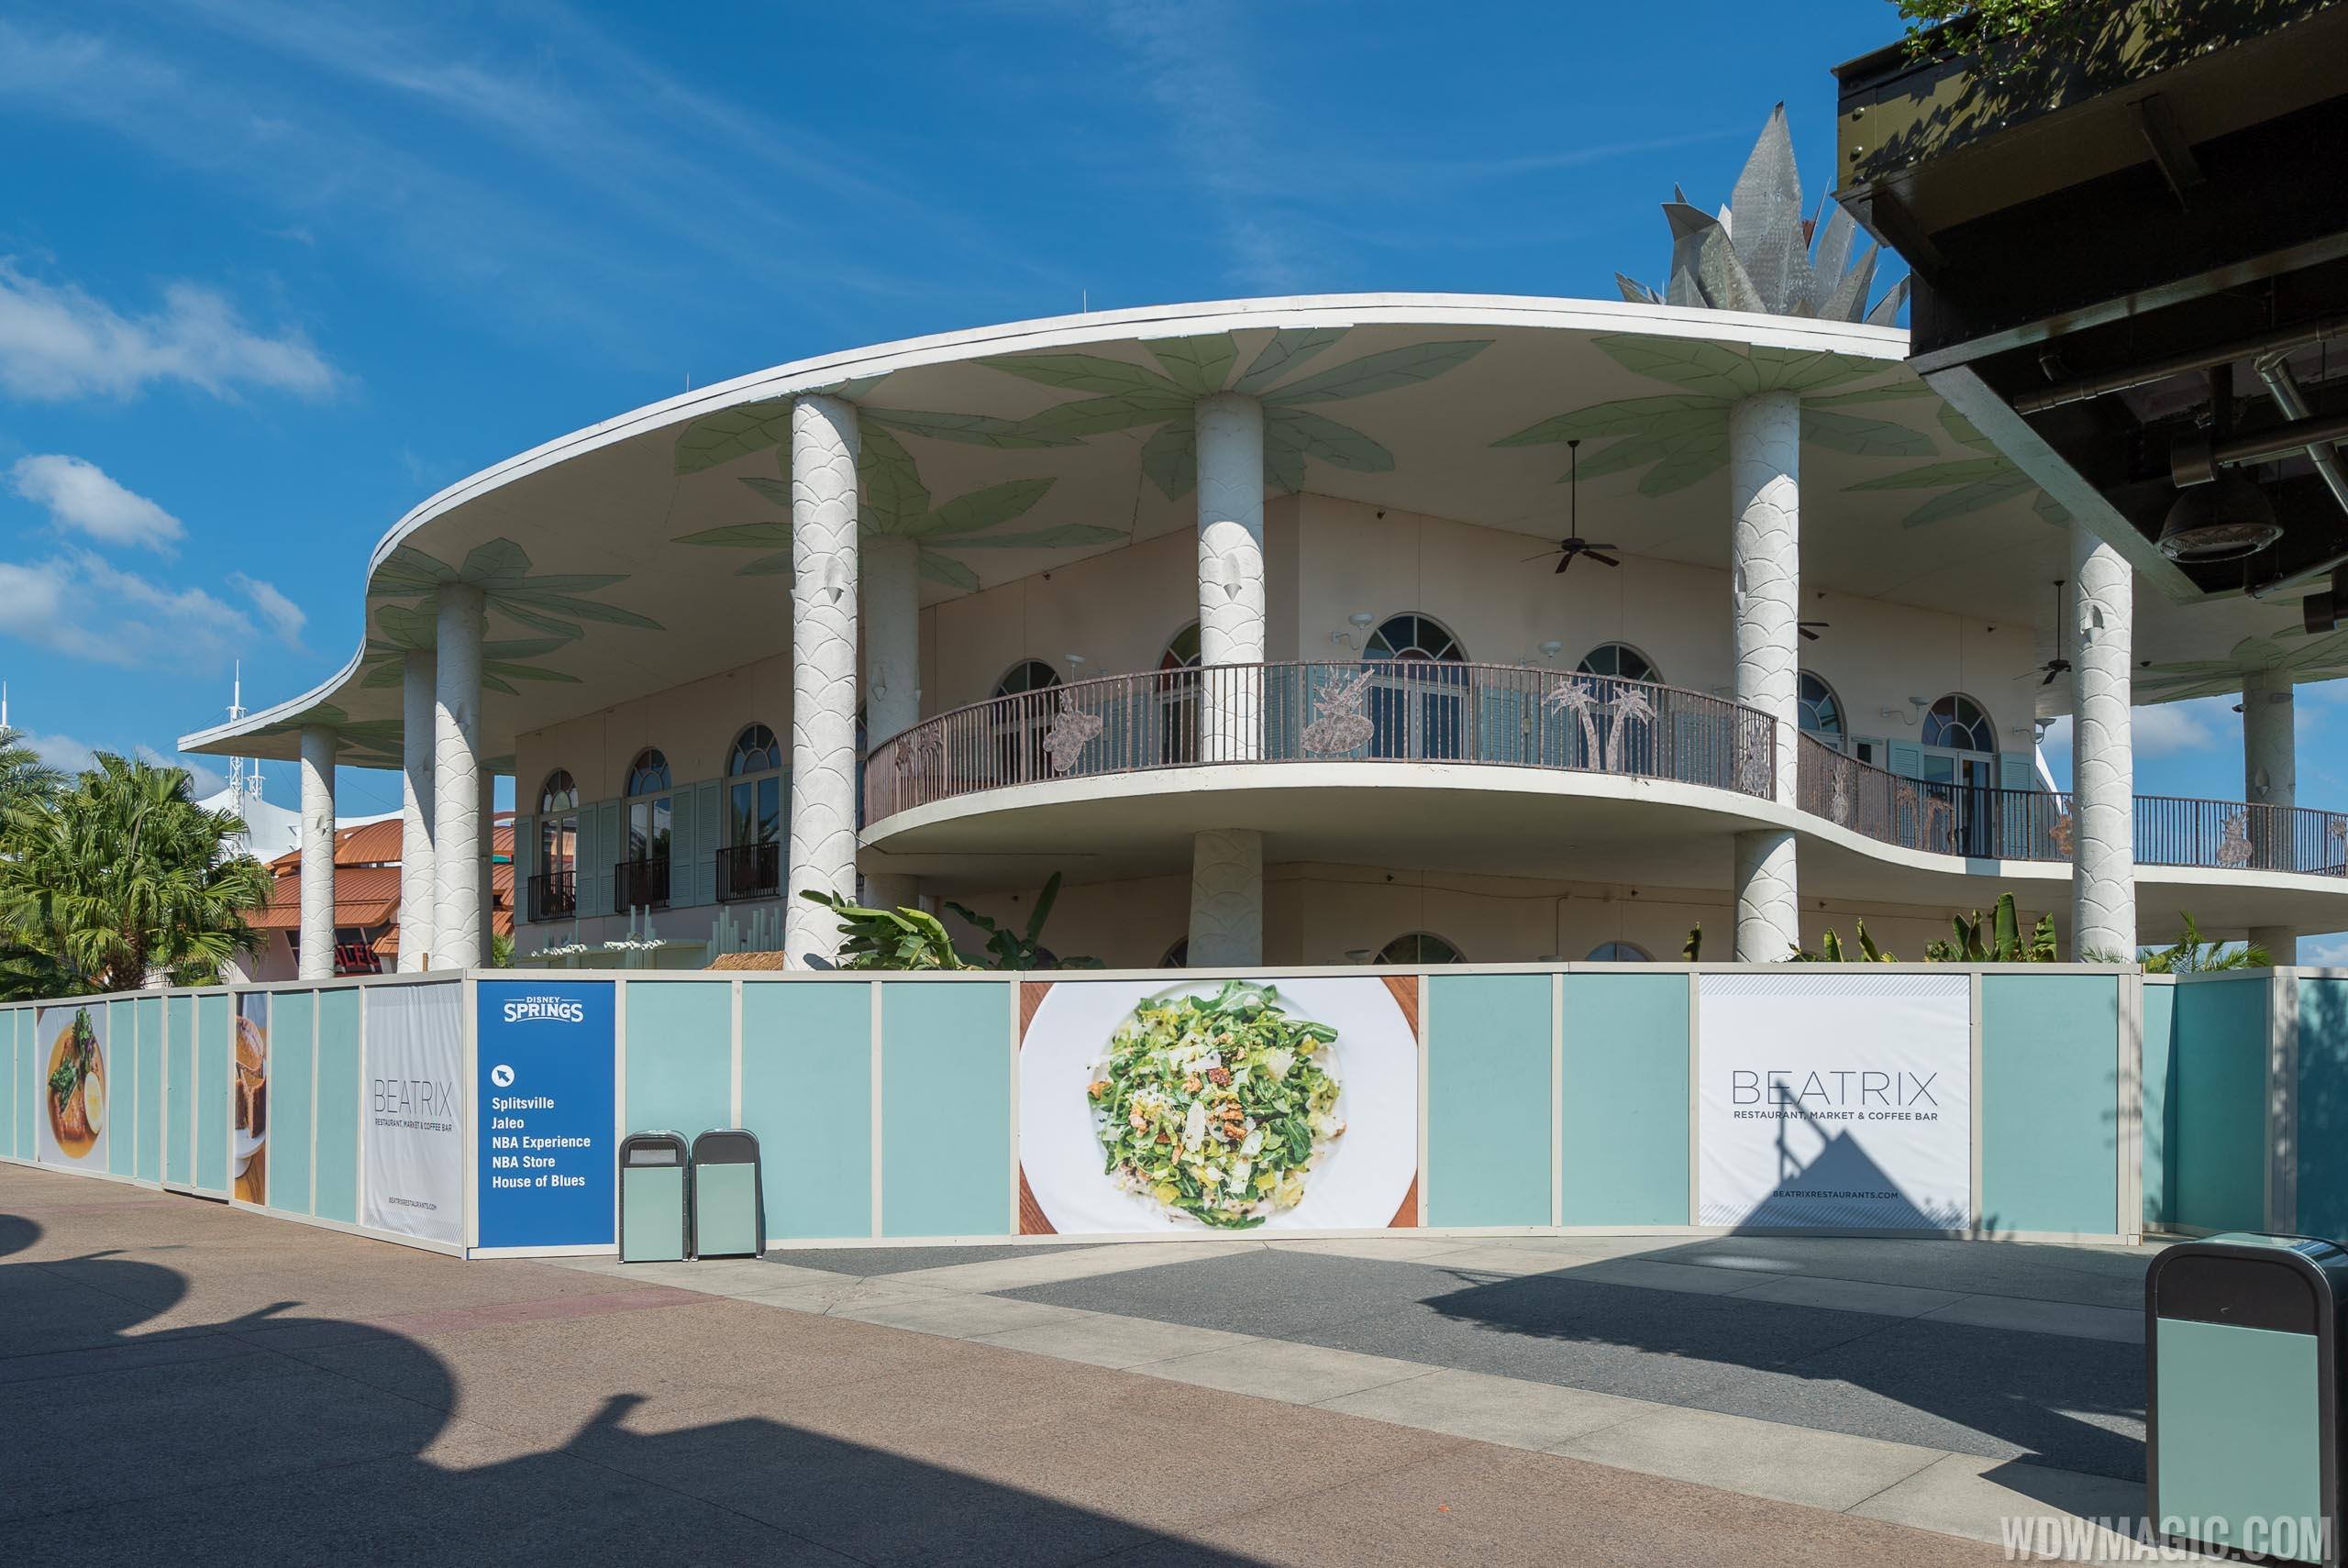 Beatrix Disney Springs construction - September 2019